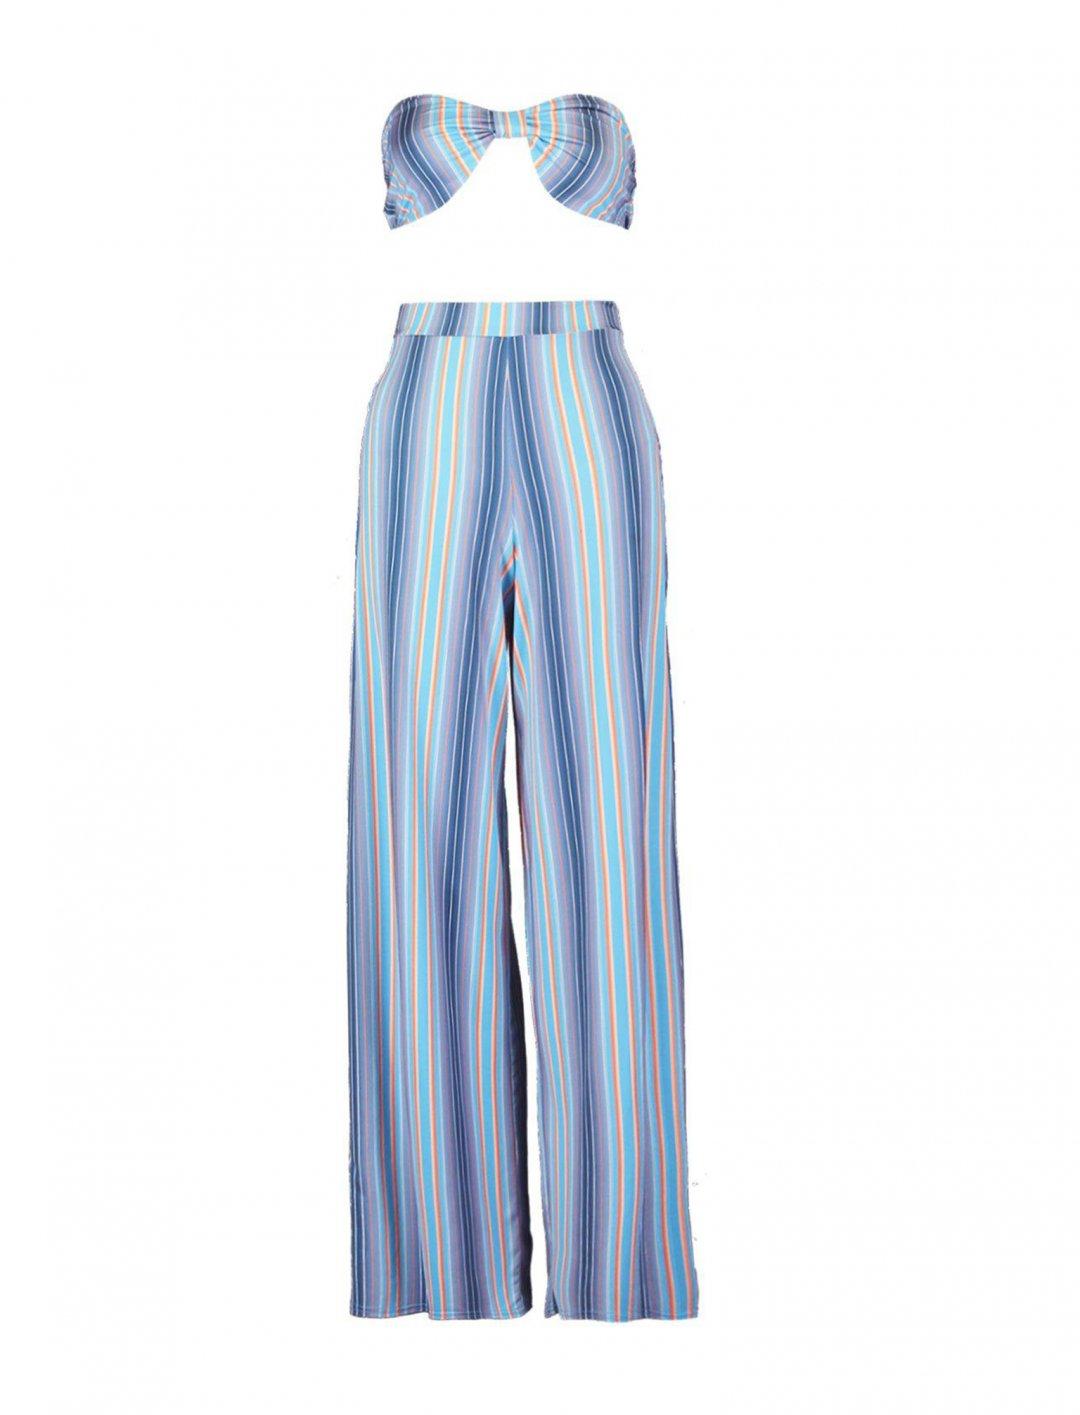 Stripe Co-Ord Clothing boohoo